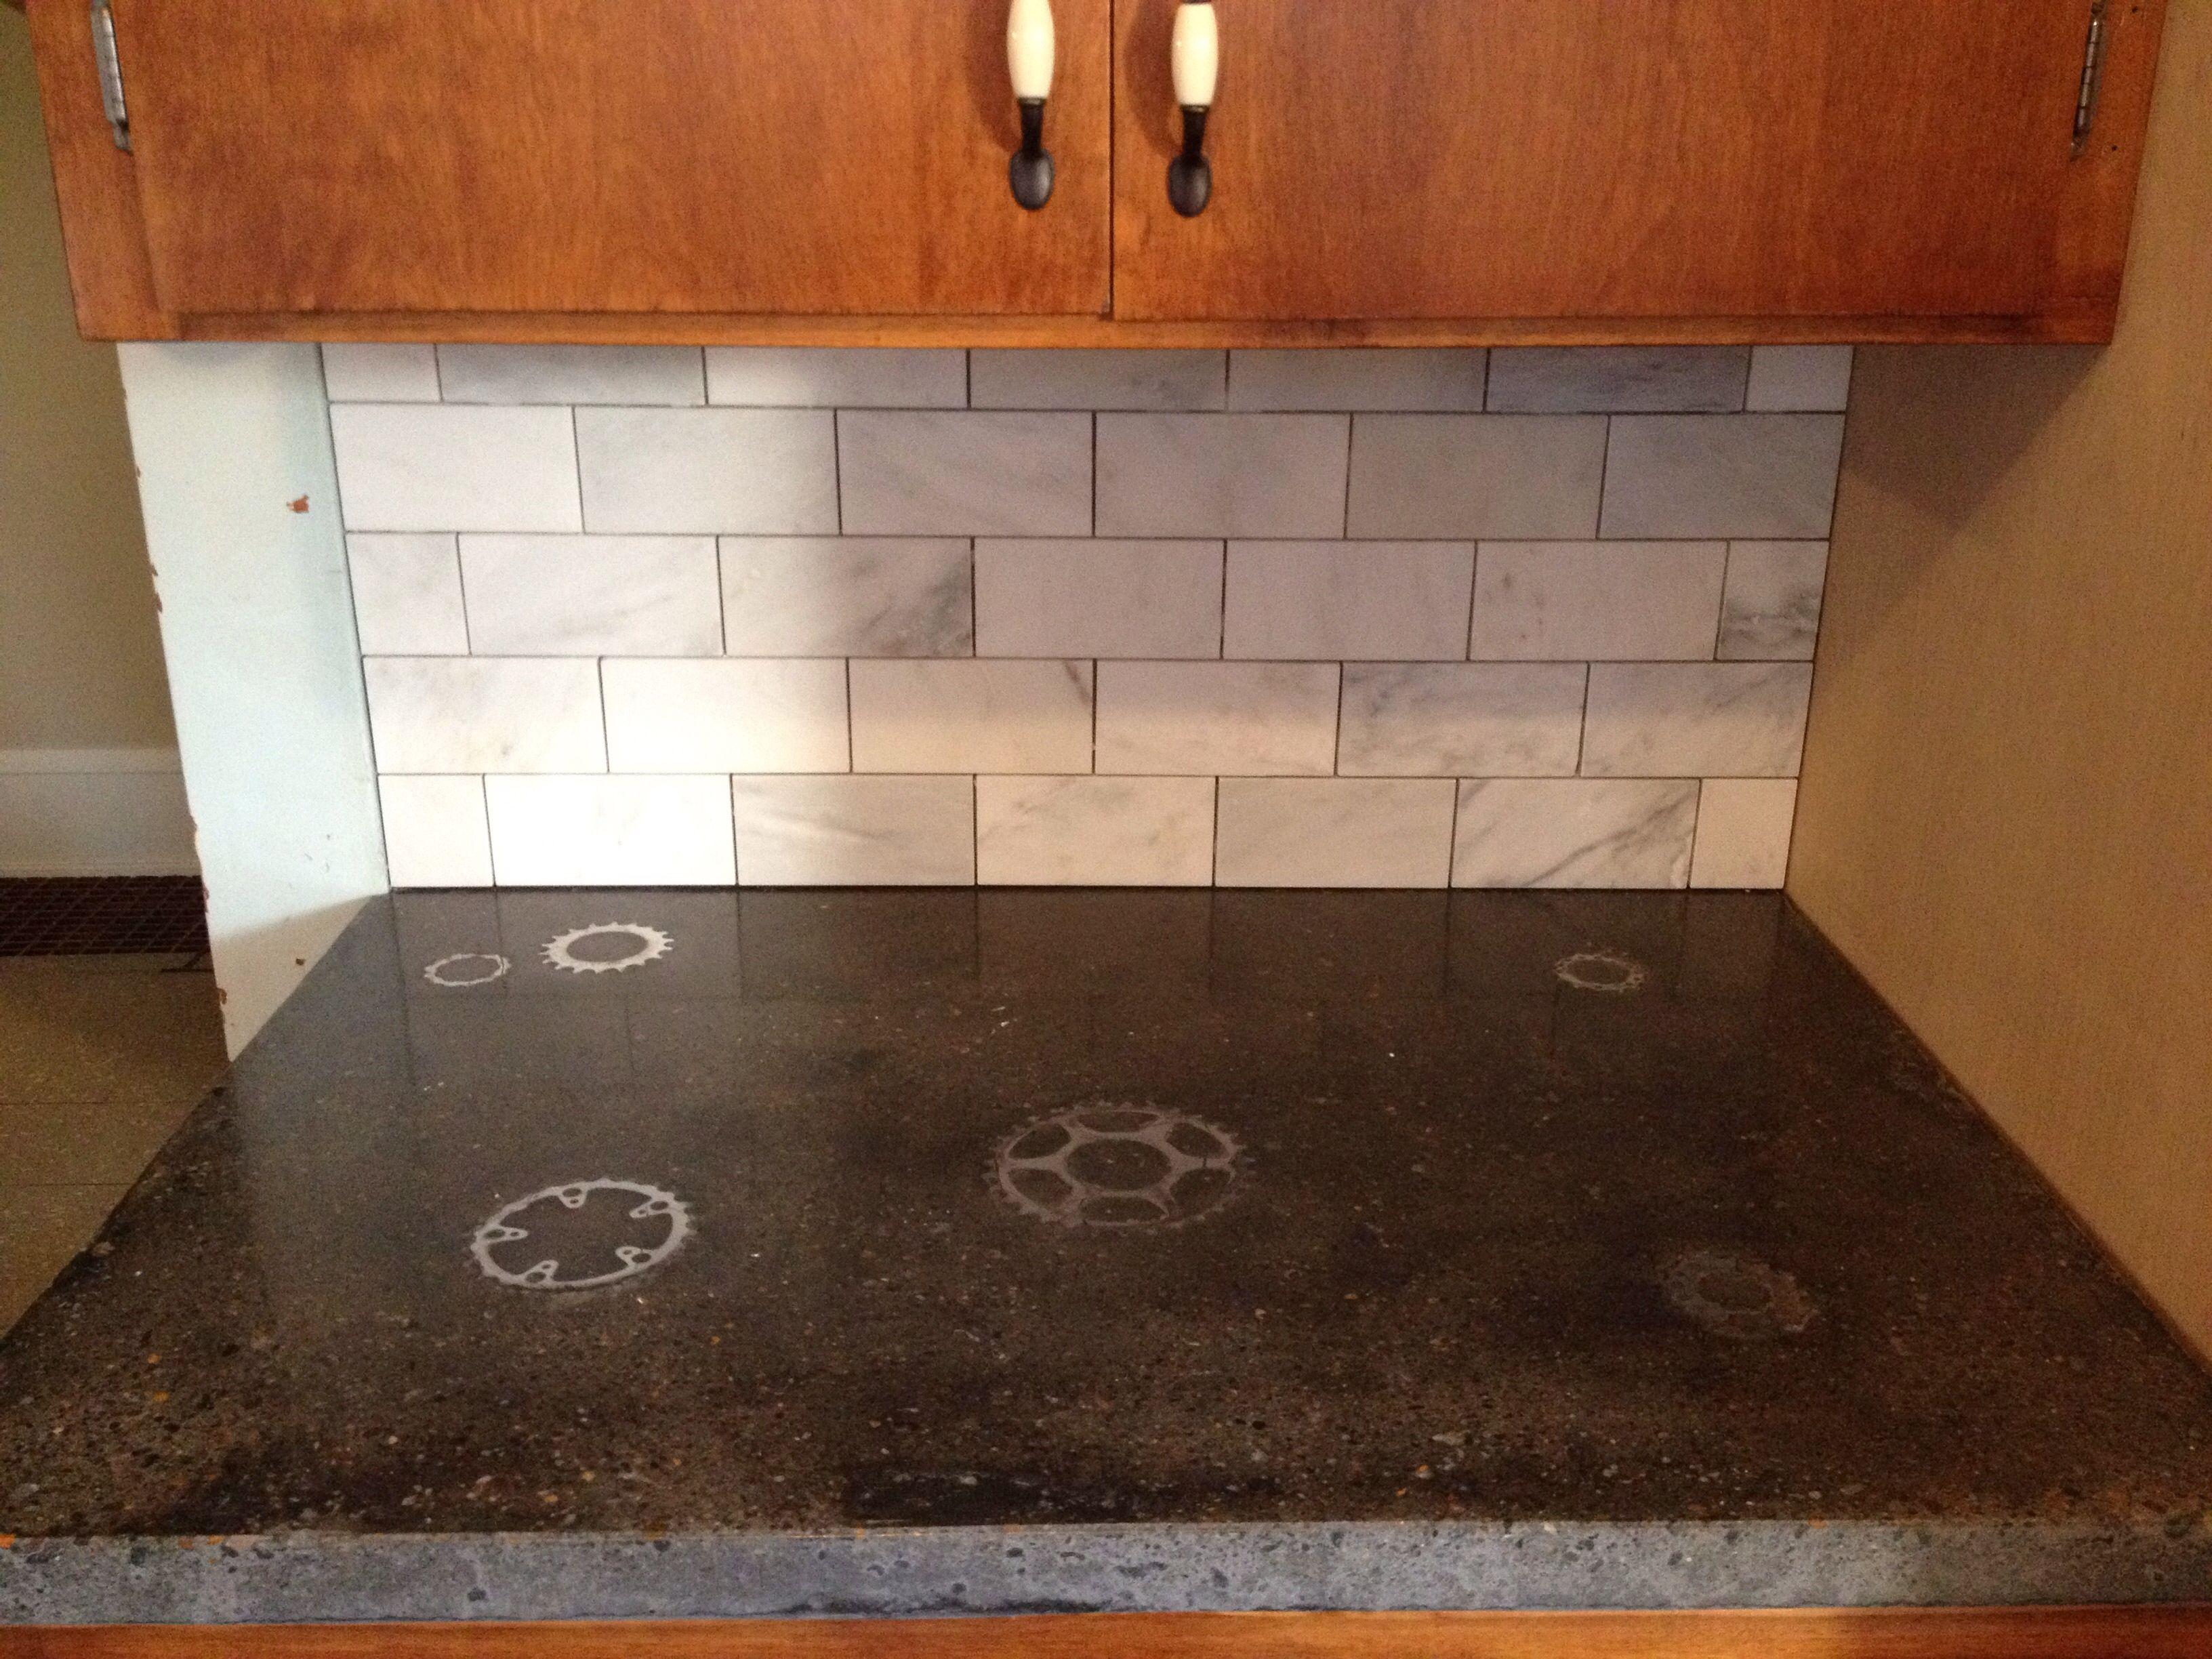 Nautilus shell inlay in concrete countertop | Kitchen | Pinterest ...